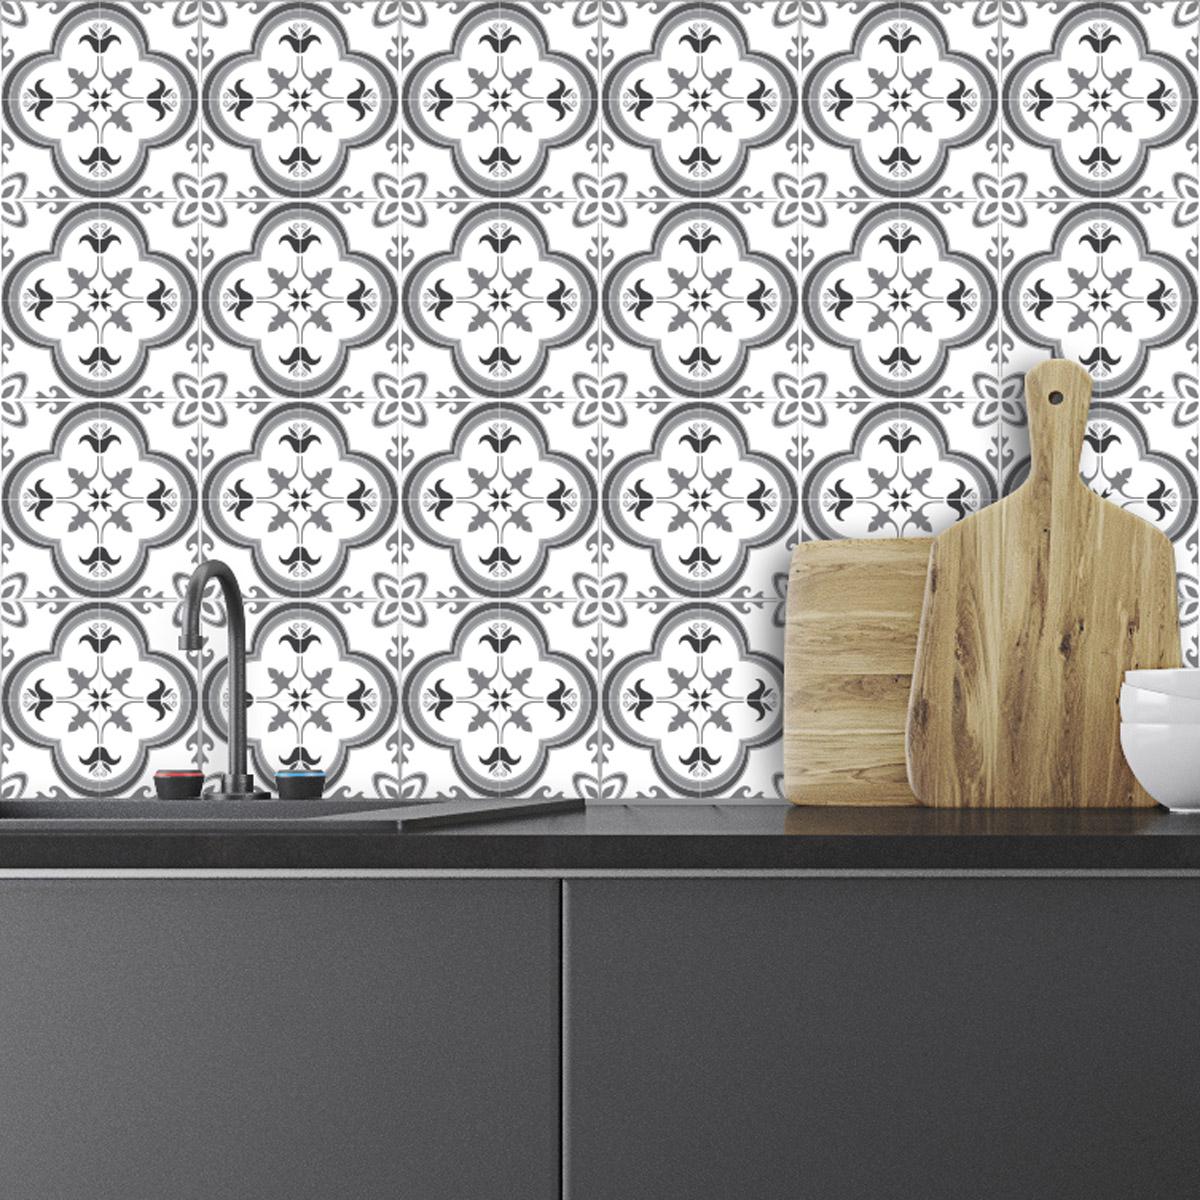 24 stickers carrelages azulejos nuance de gris somptueux art et design artistiques ambiance. Black Bedroom Furniture Sets. Home Design Ideas